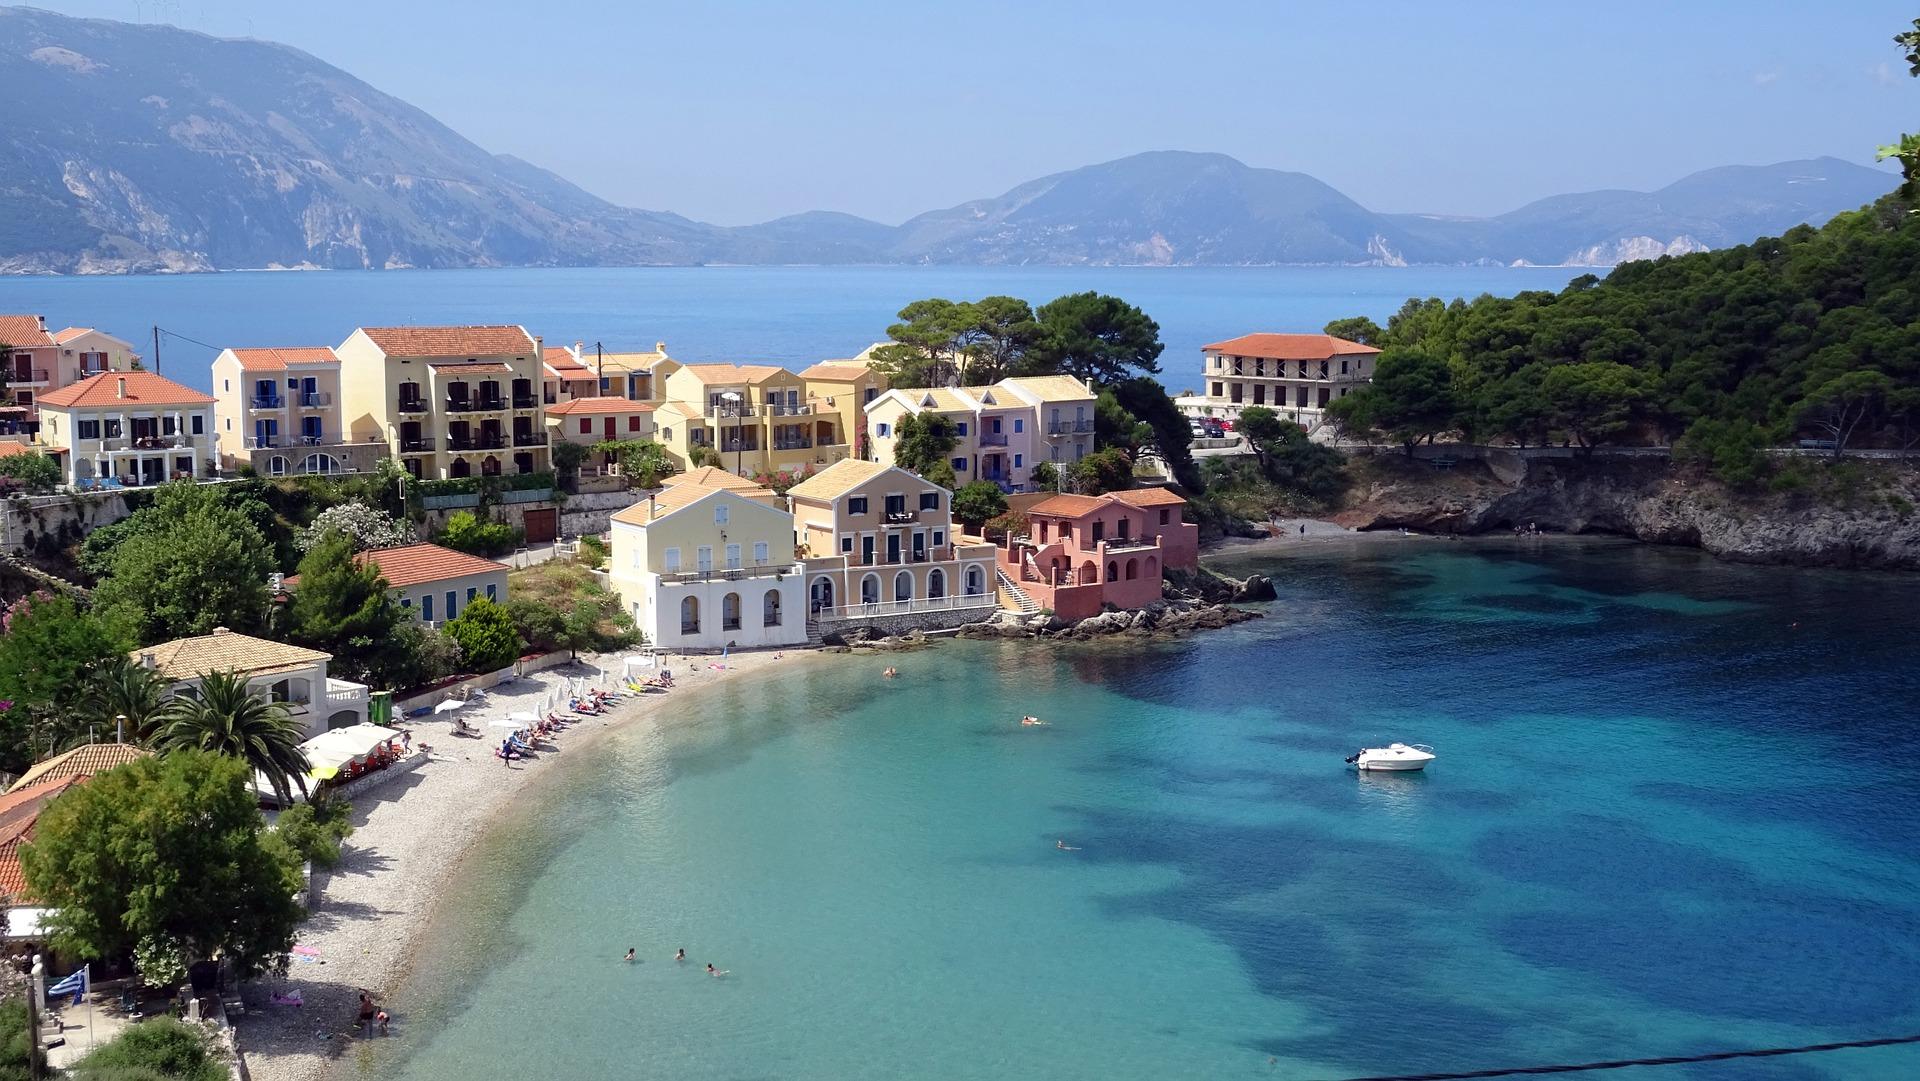 Cephalonia (Kefalonia), Greece